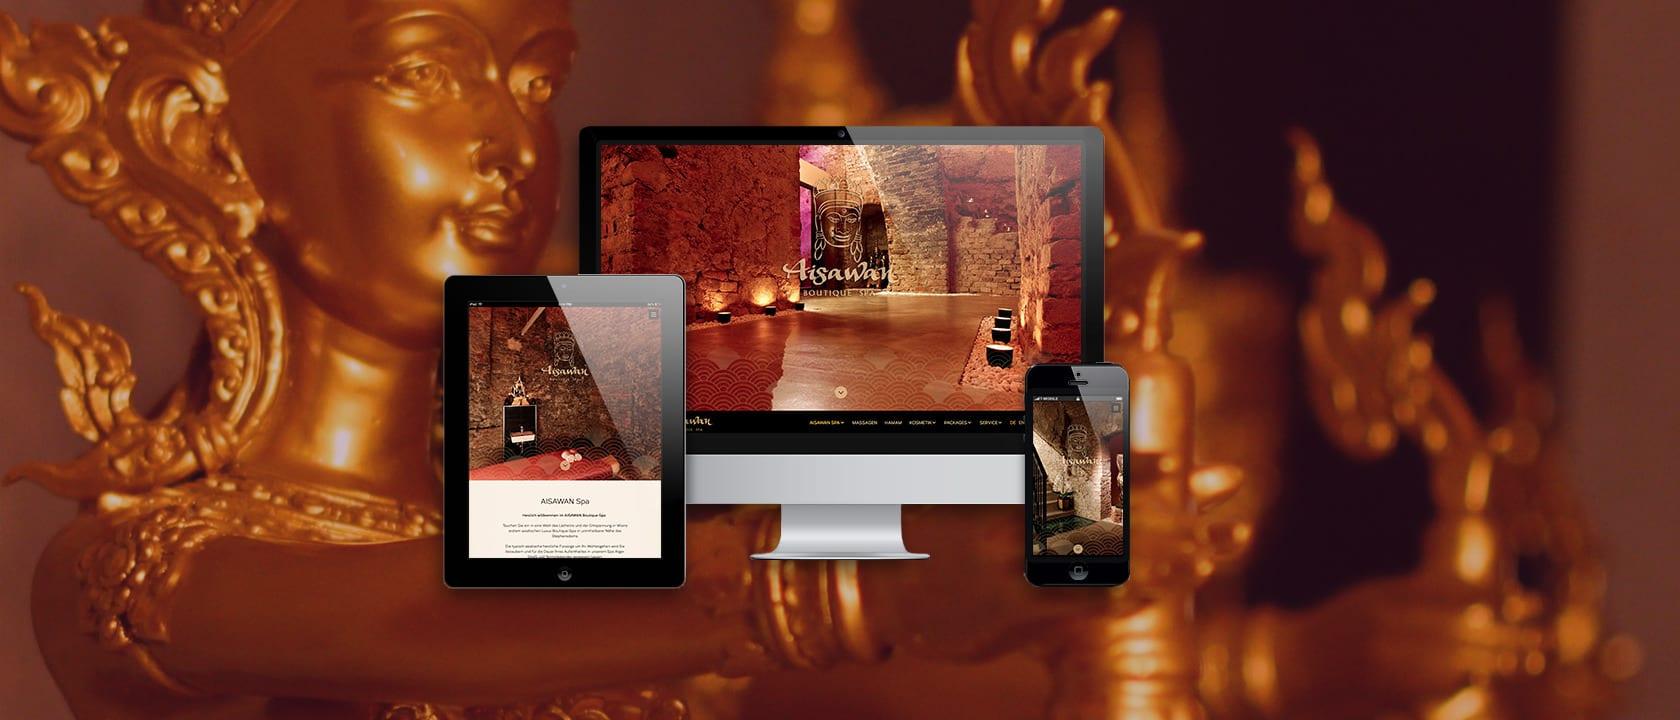 Webdesign 1180 Wien